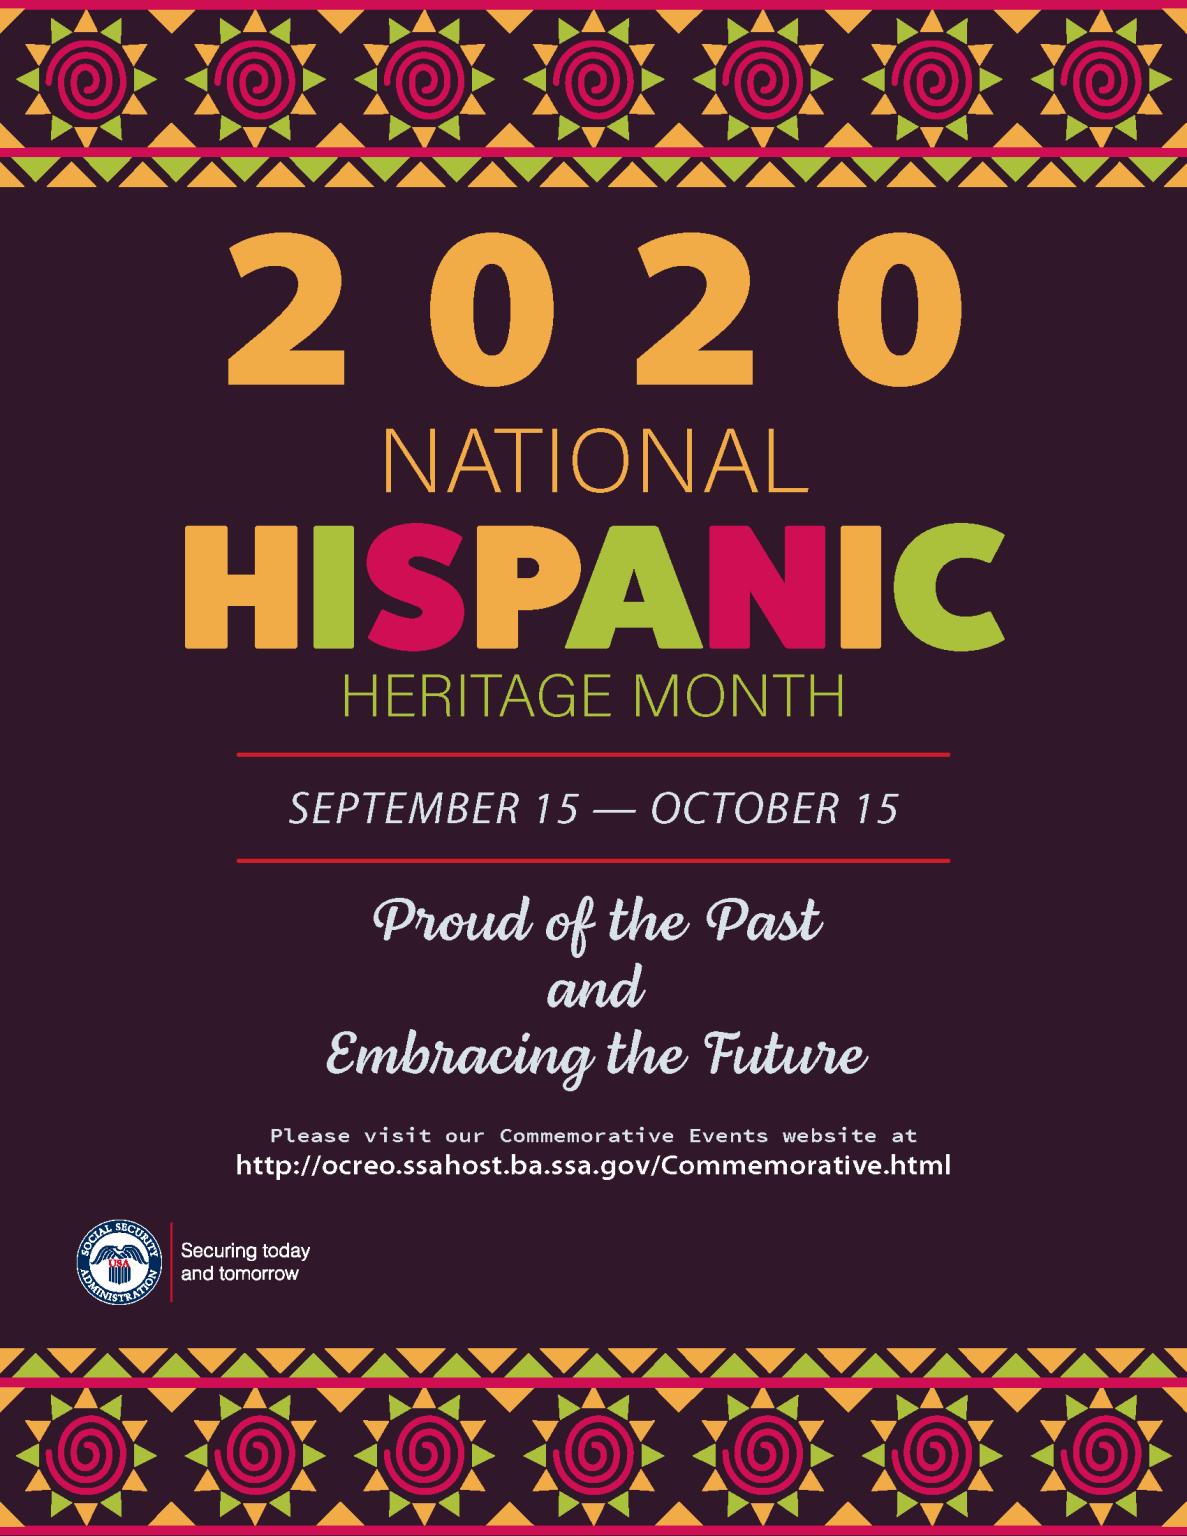 September 15 October 15 National Hispanic Heritage